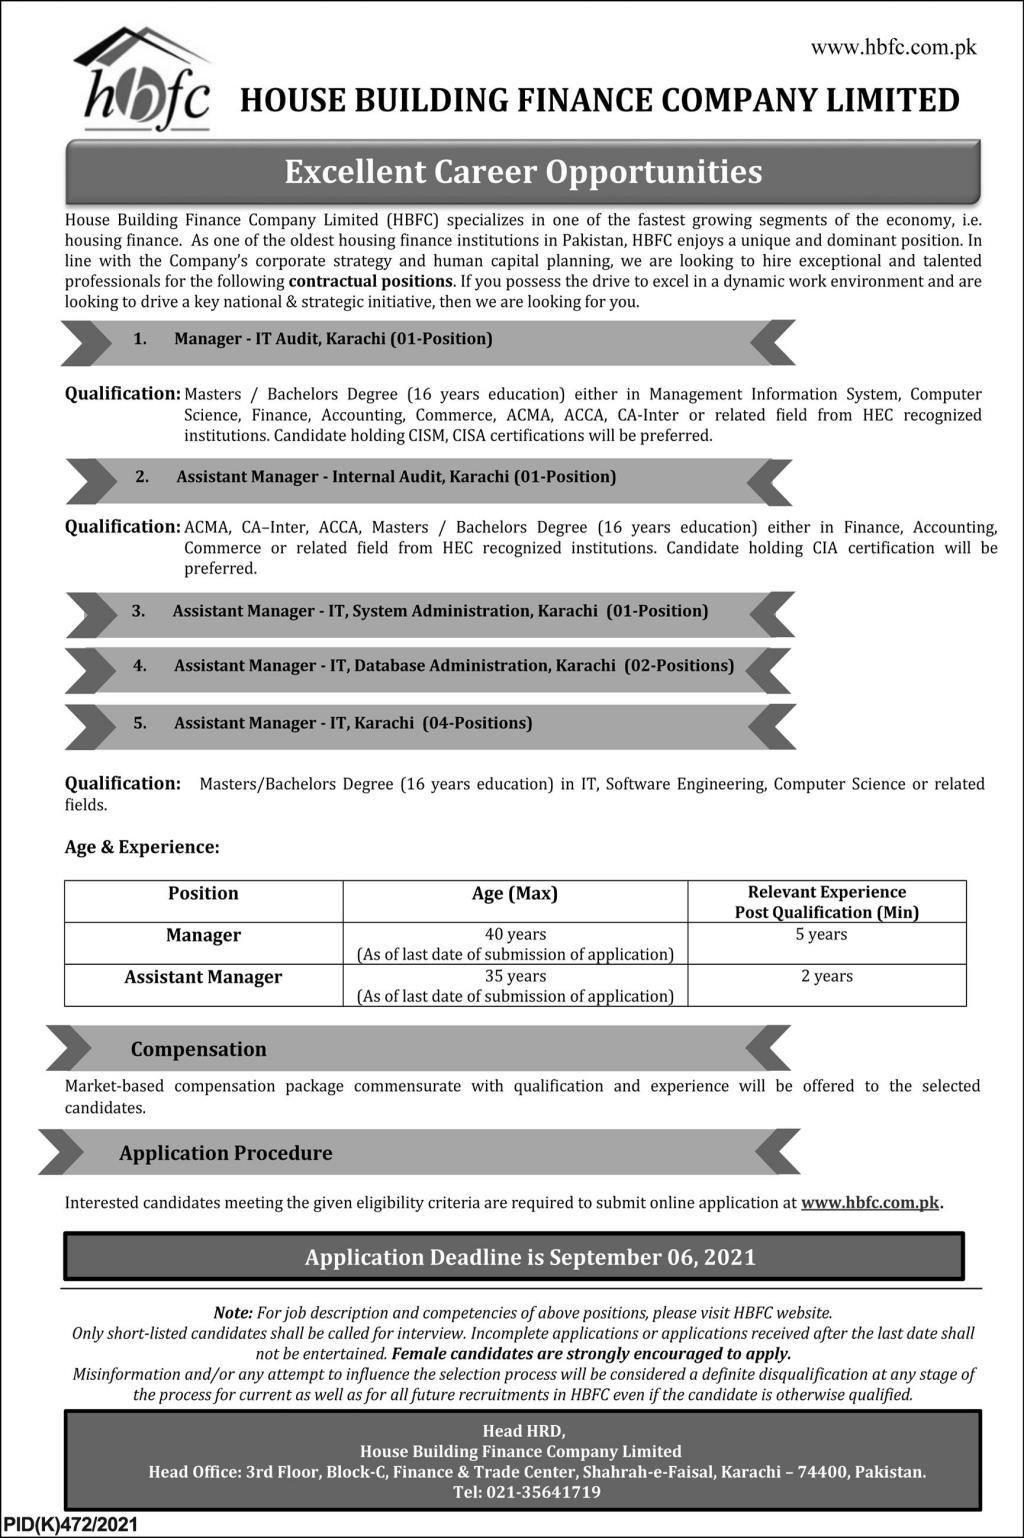 House Building Finance Company Limited HBFC Jobs Karachi 2021